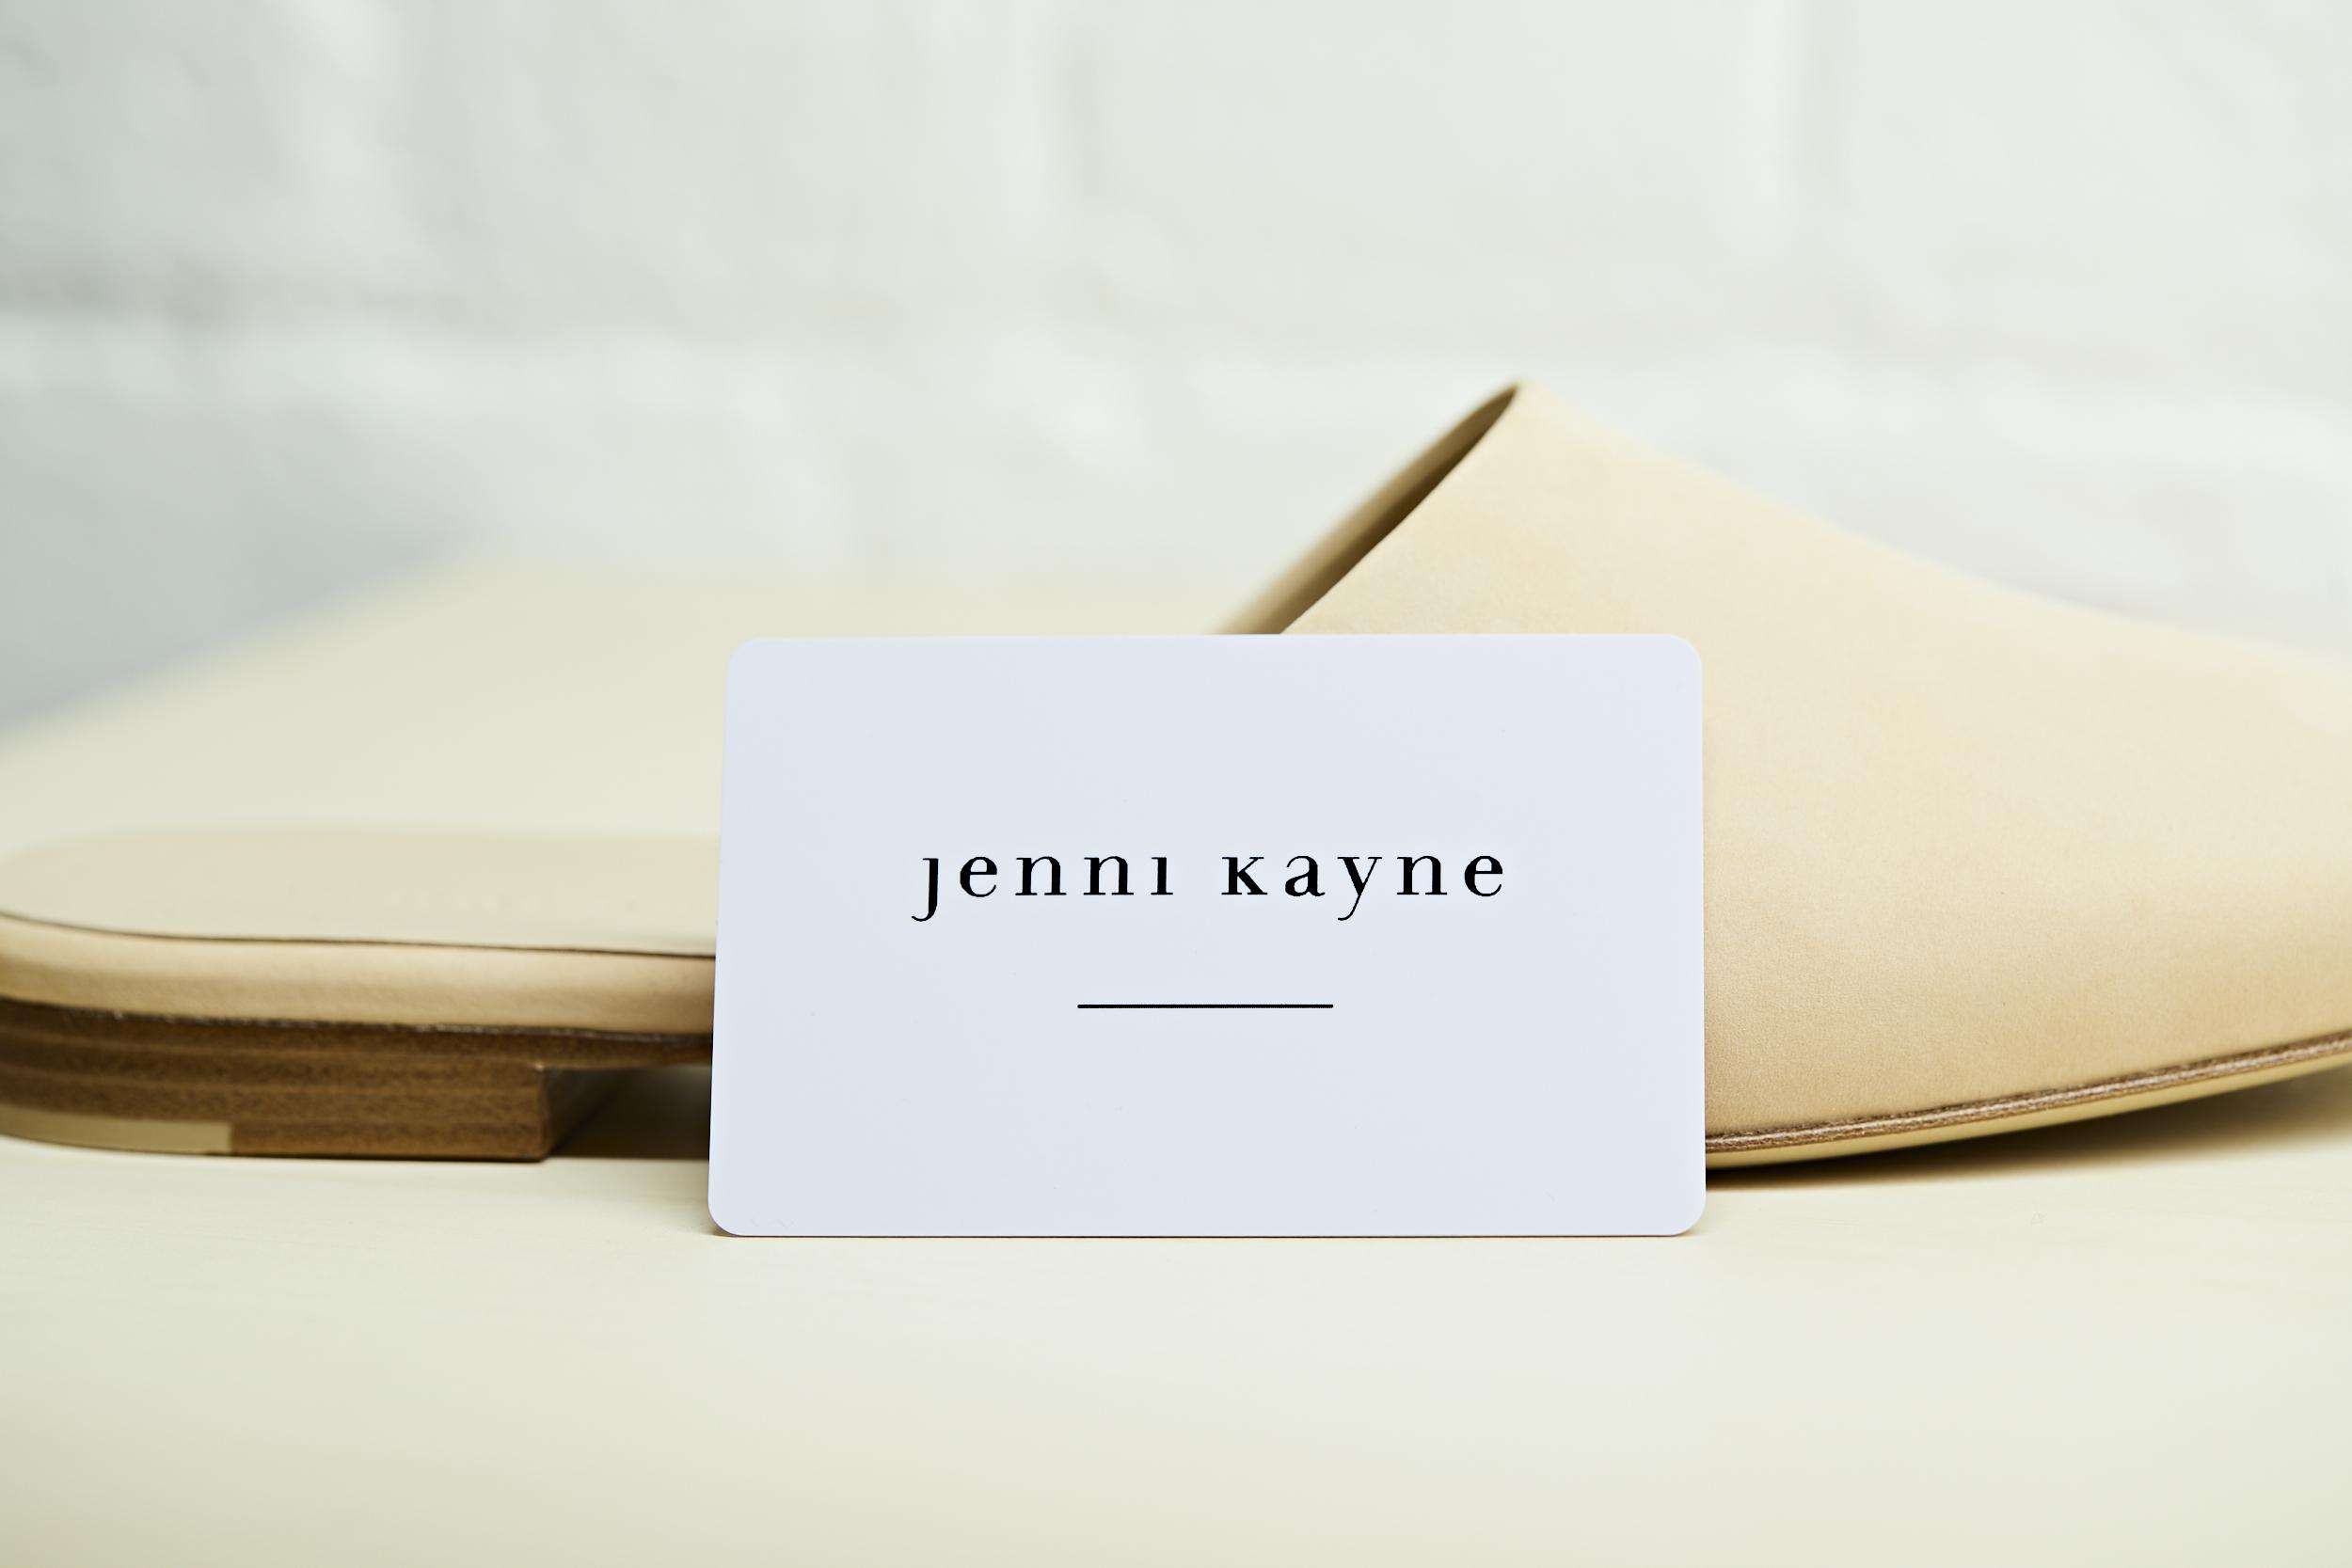 180117_JF_JK_GIFT_SET_GIFT_CARD_142.jpg